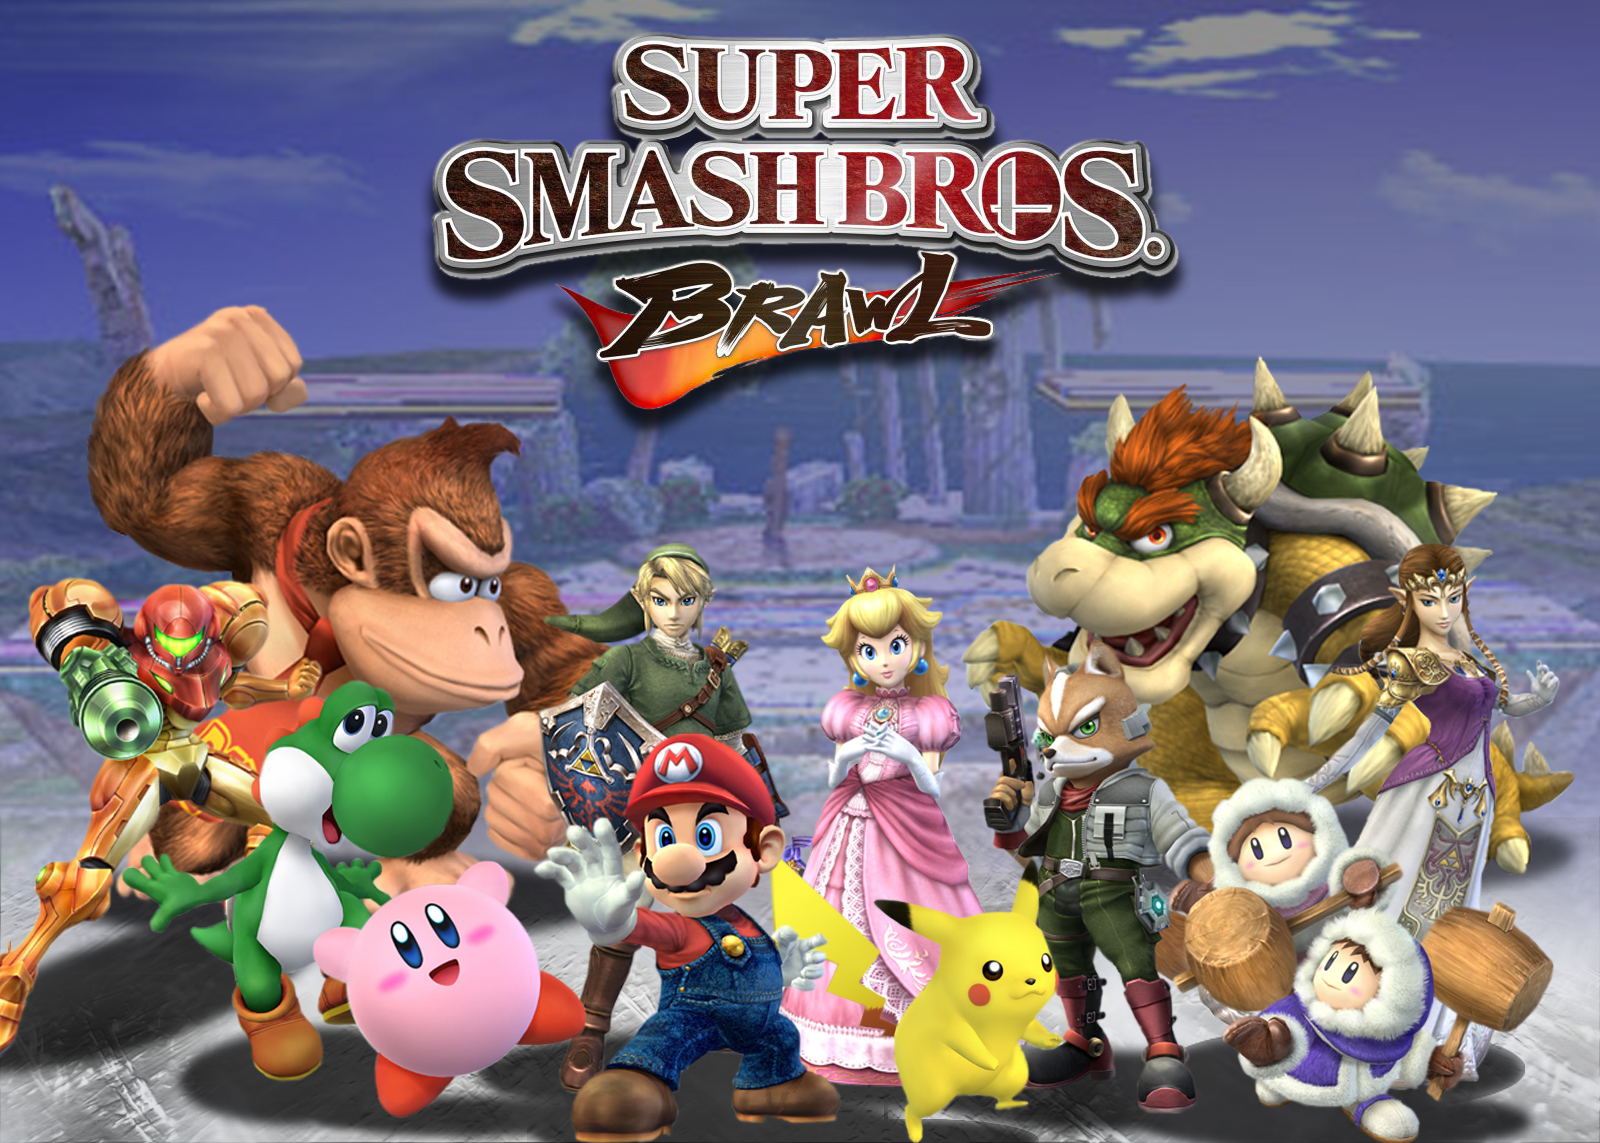 Disney HD Wallpapers Super Smash Bros Brawl